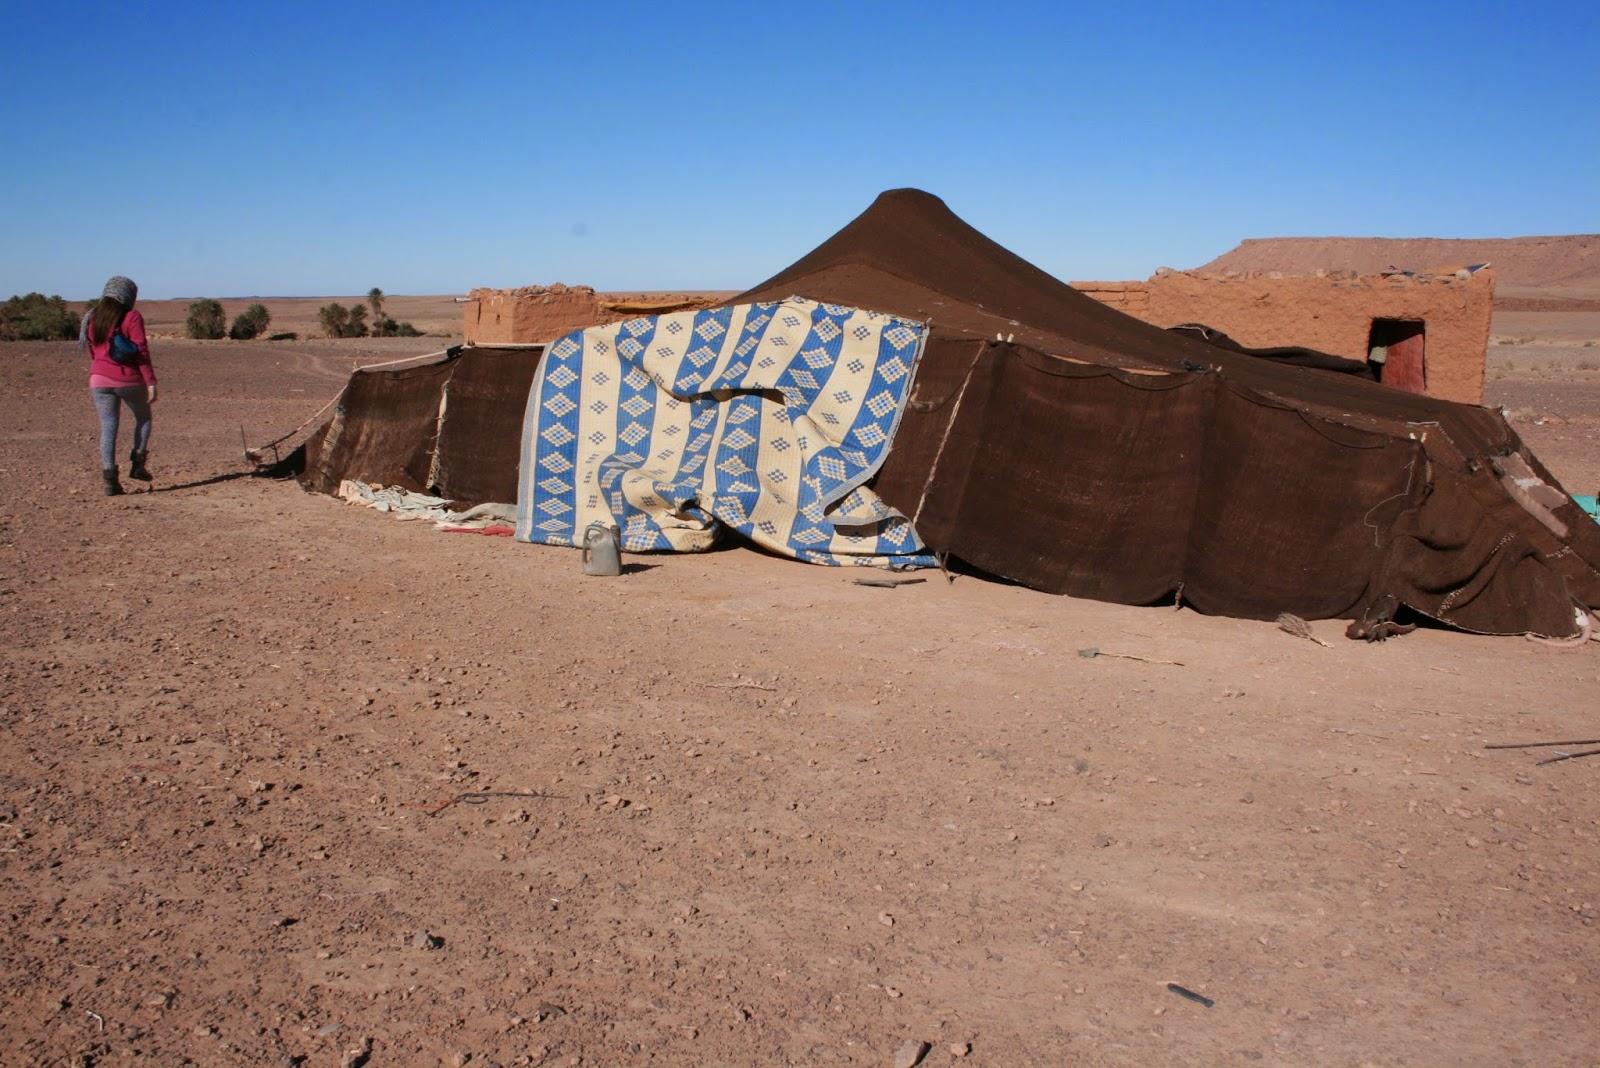 marrakech, arfoud, erg chebi, dunas, marruecos, viajes, aventura, alojamiento